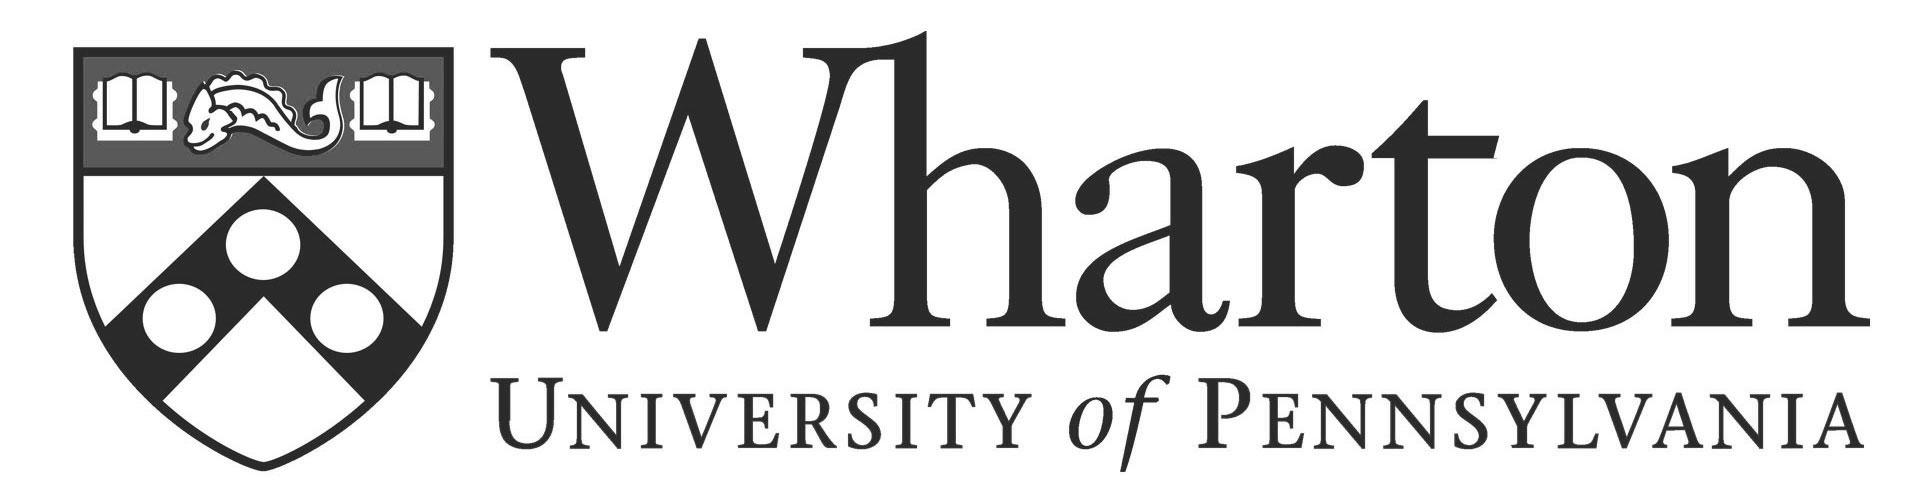 image of the wharton university logo 2